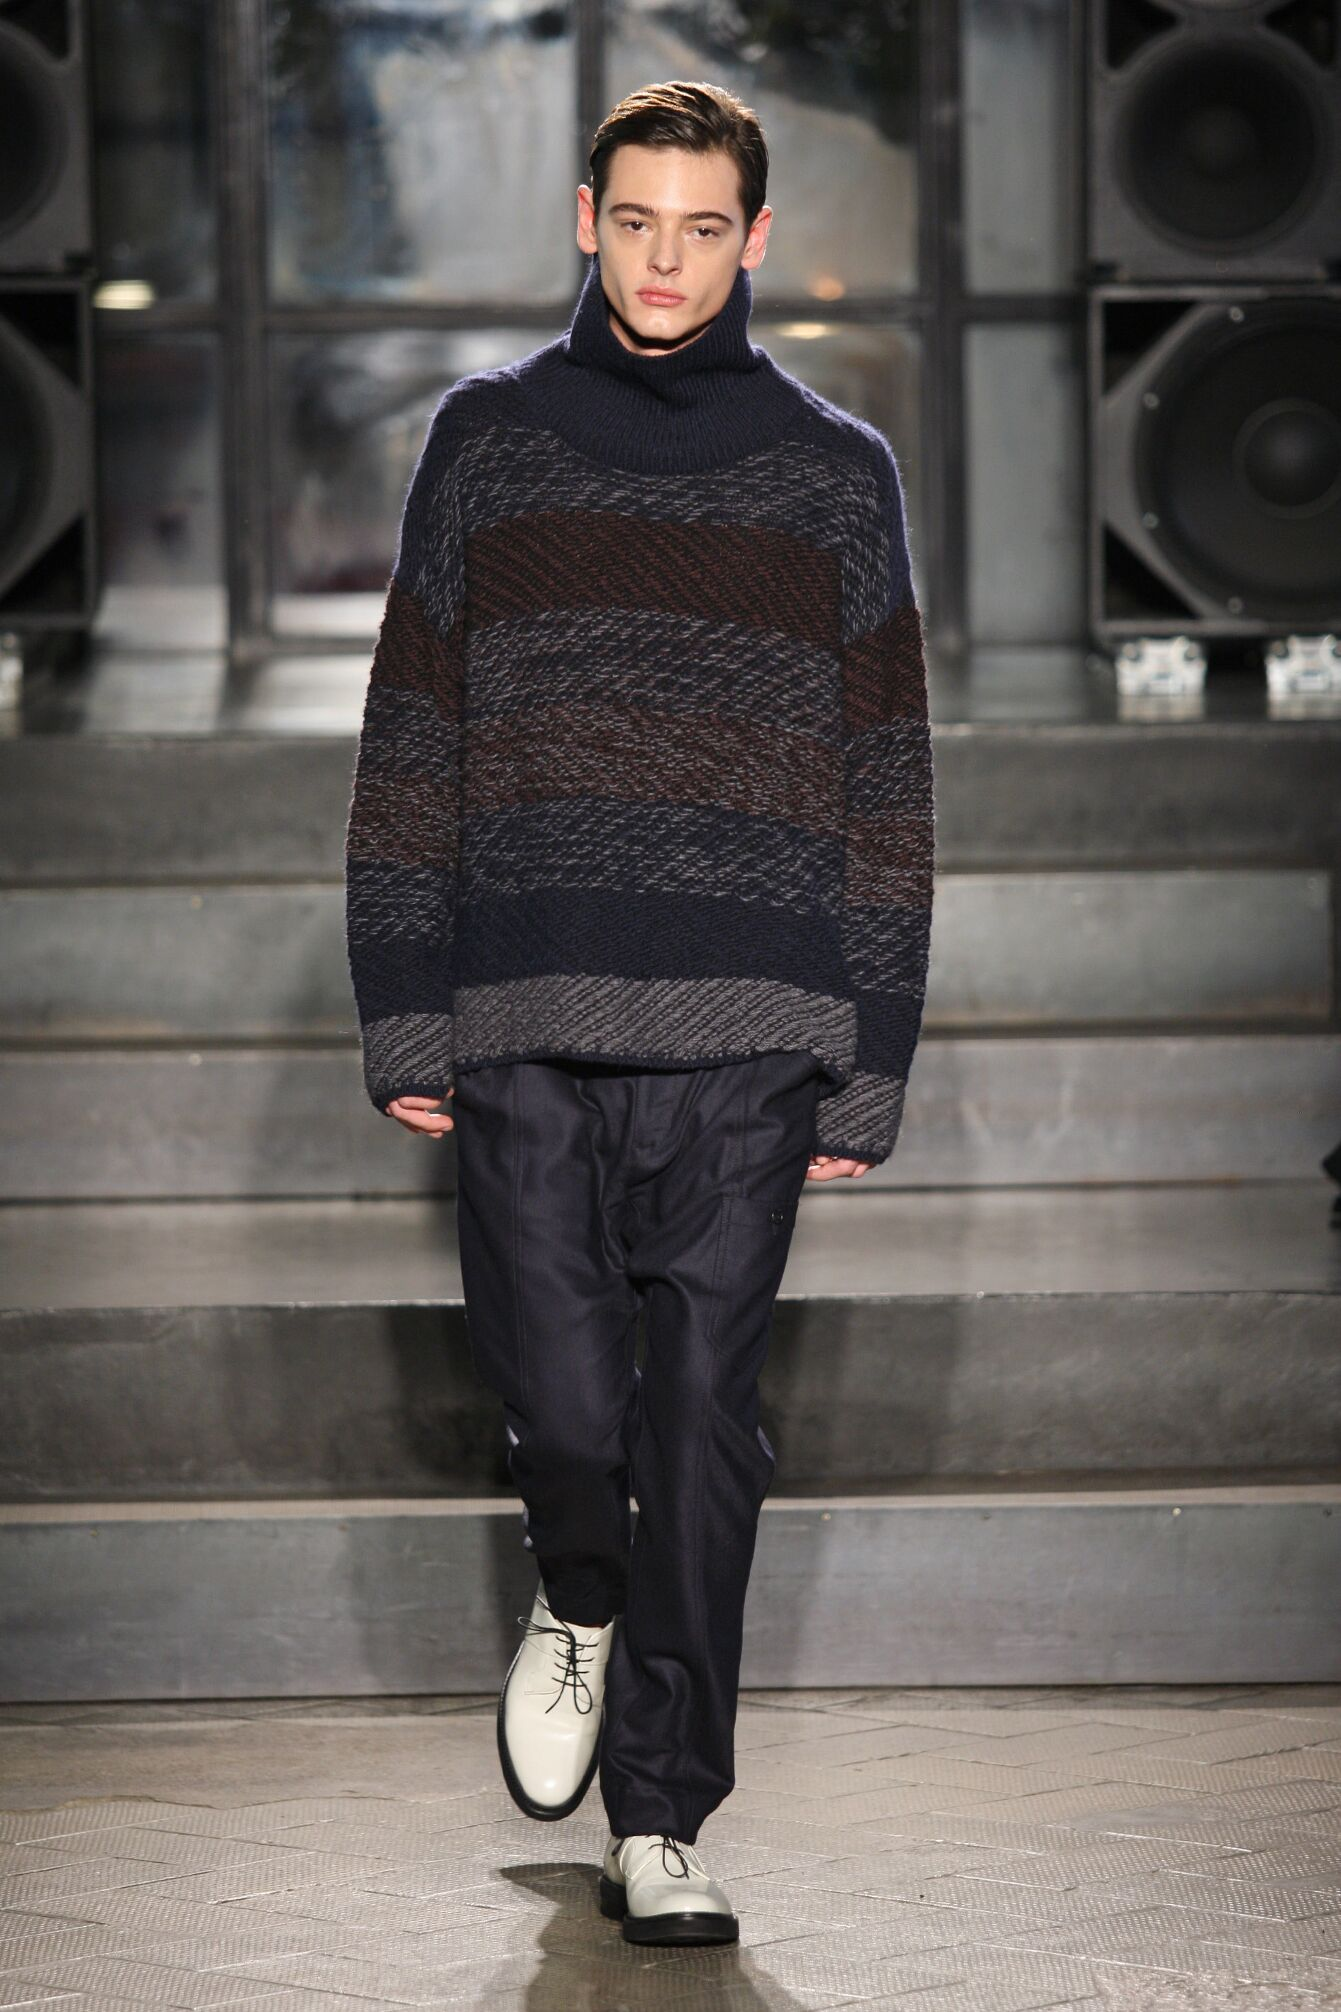 Antonio Marras Fall Winter 2014 15 Mens Collection Milano Fashion Week